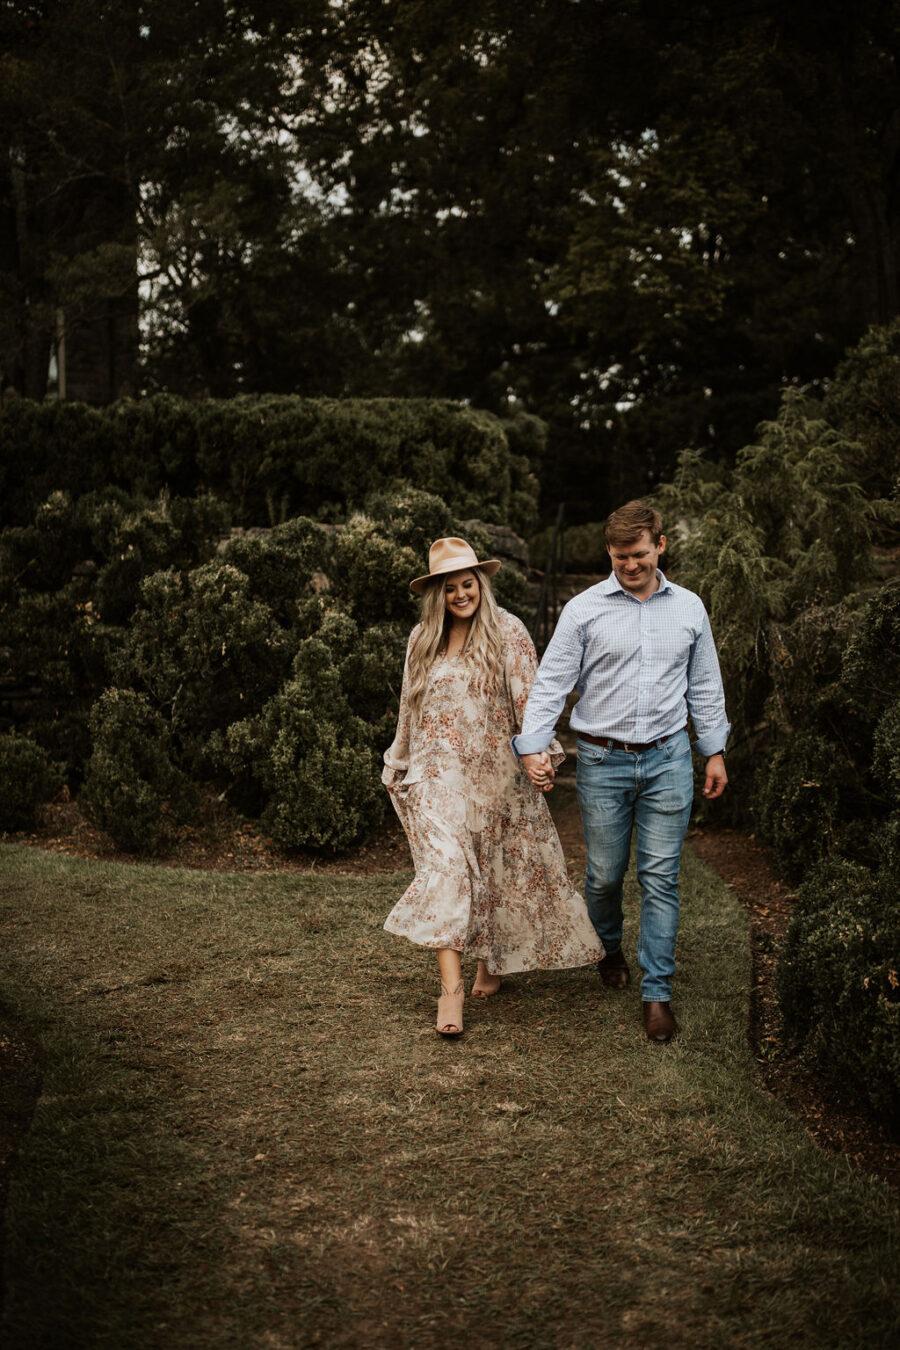 Garden Engagement Session captured by Sydney Lauren Photography | Nashville Bride Guide